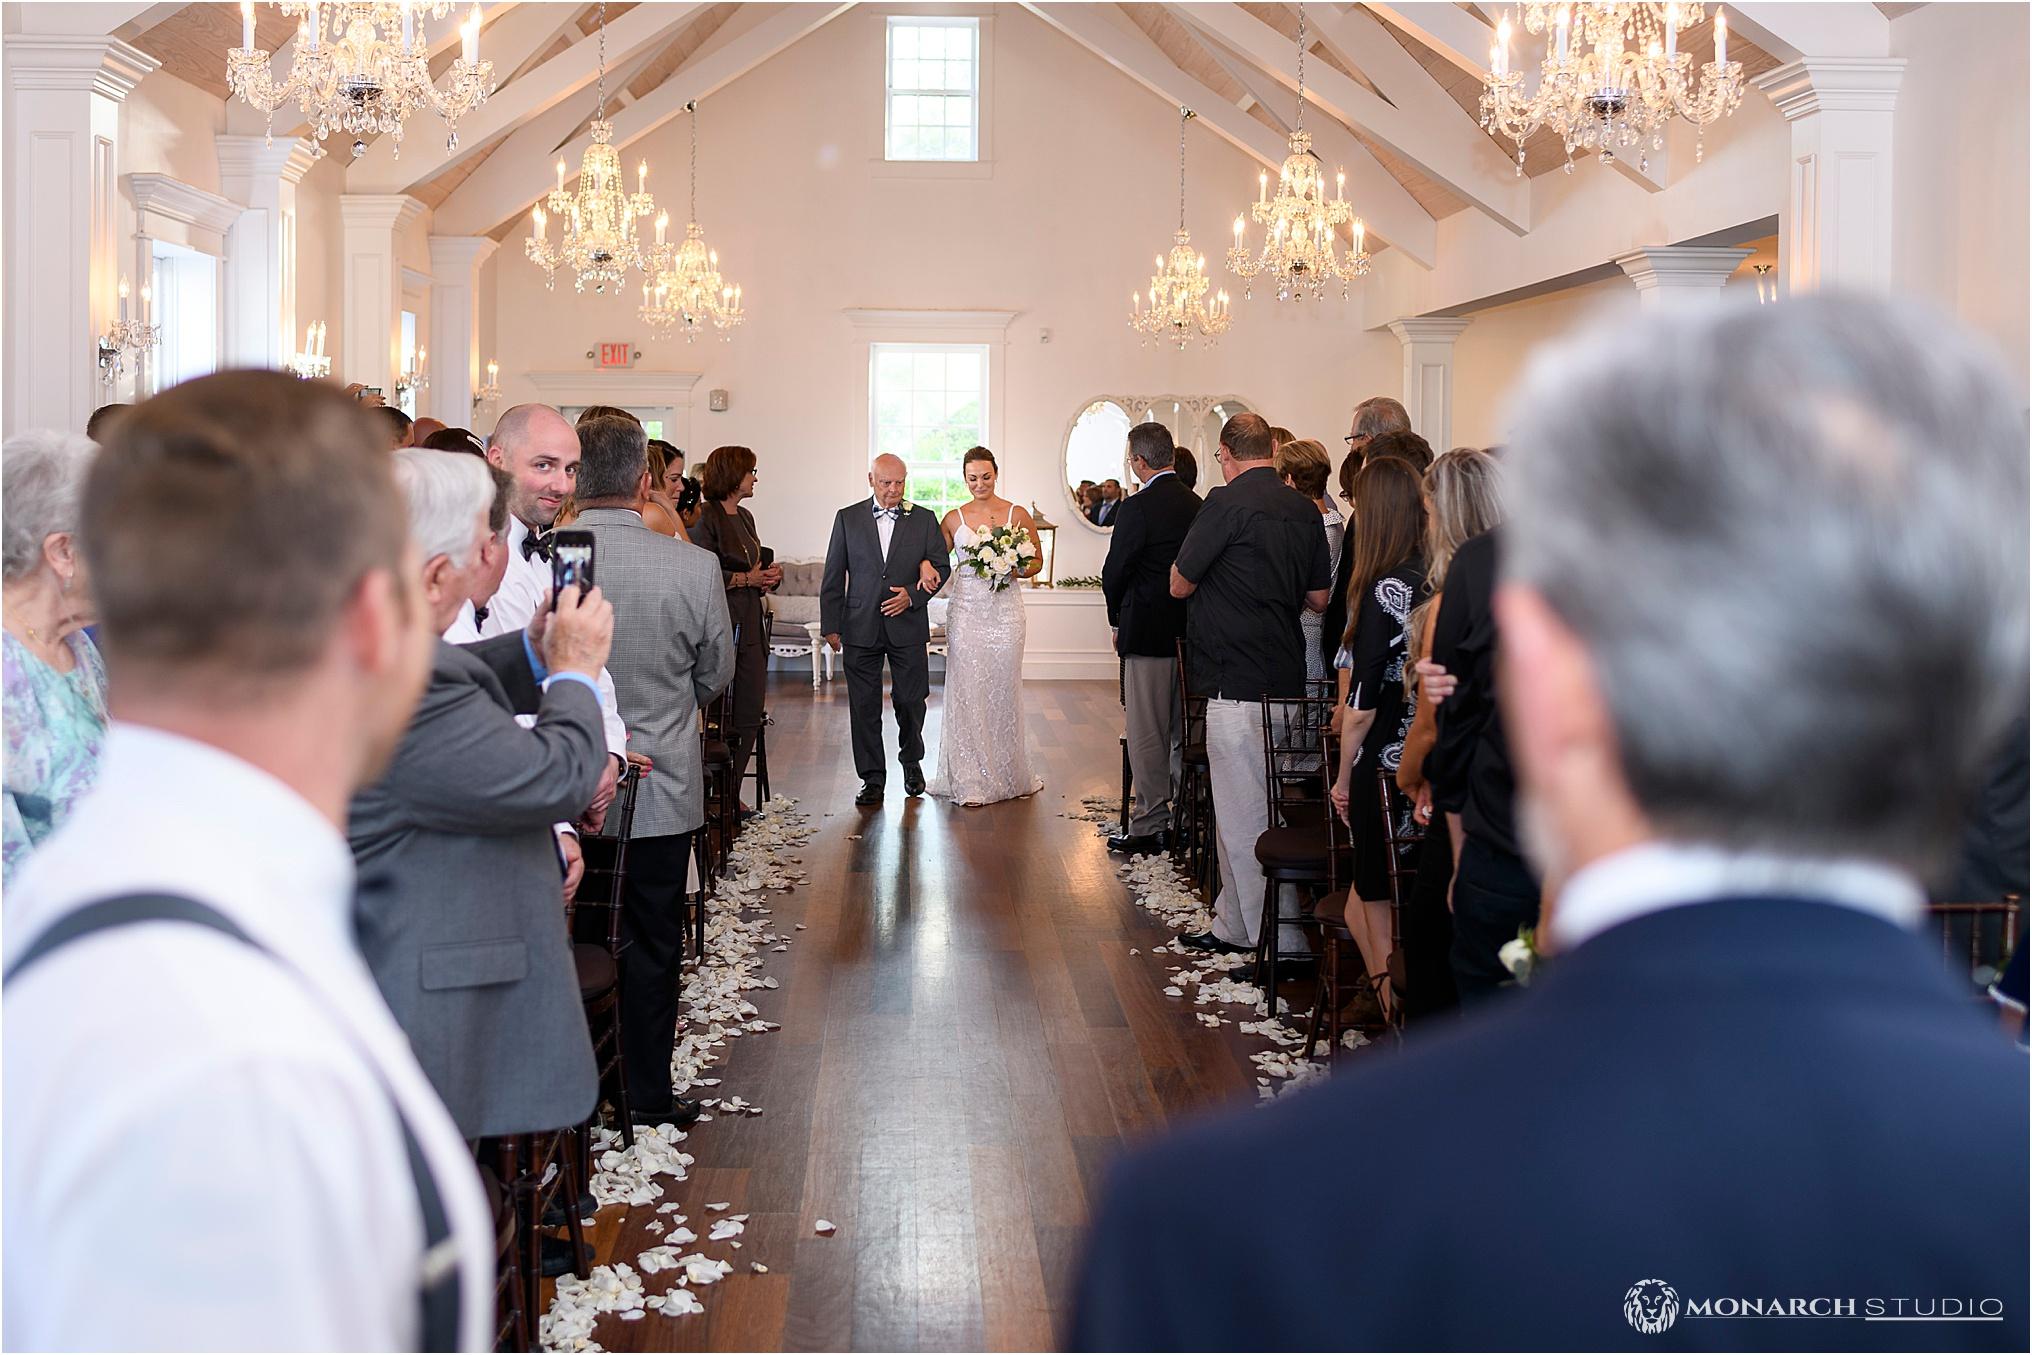 066-whiteroom-wedding-photographer-2019-05-22_0048.jpg